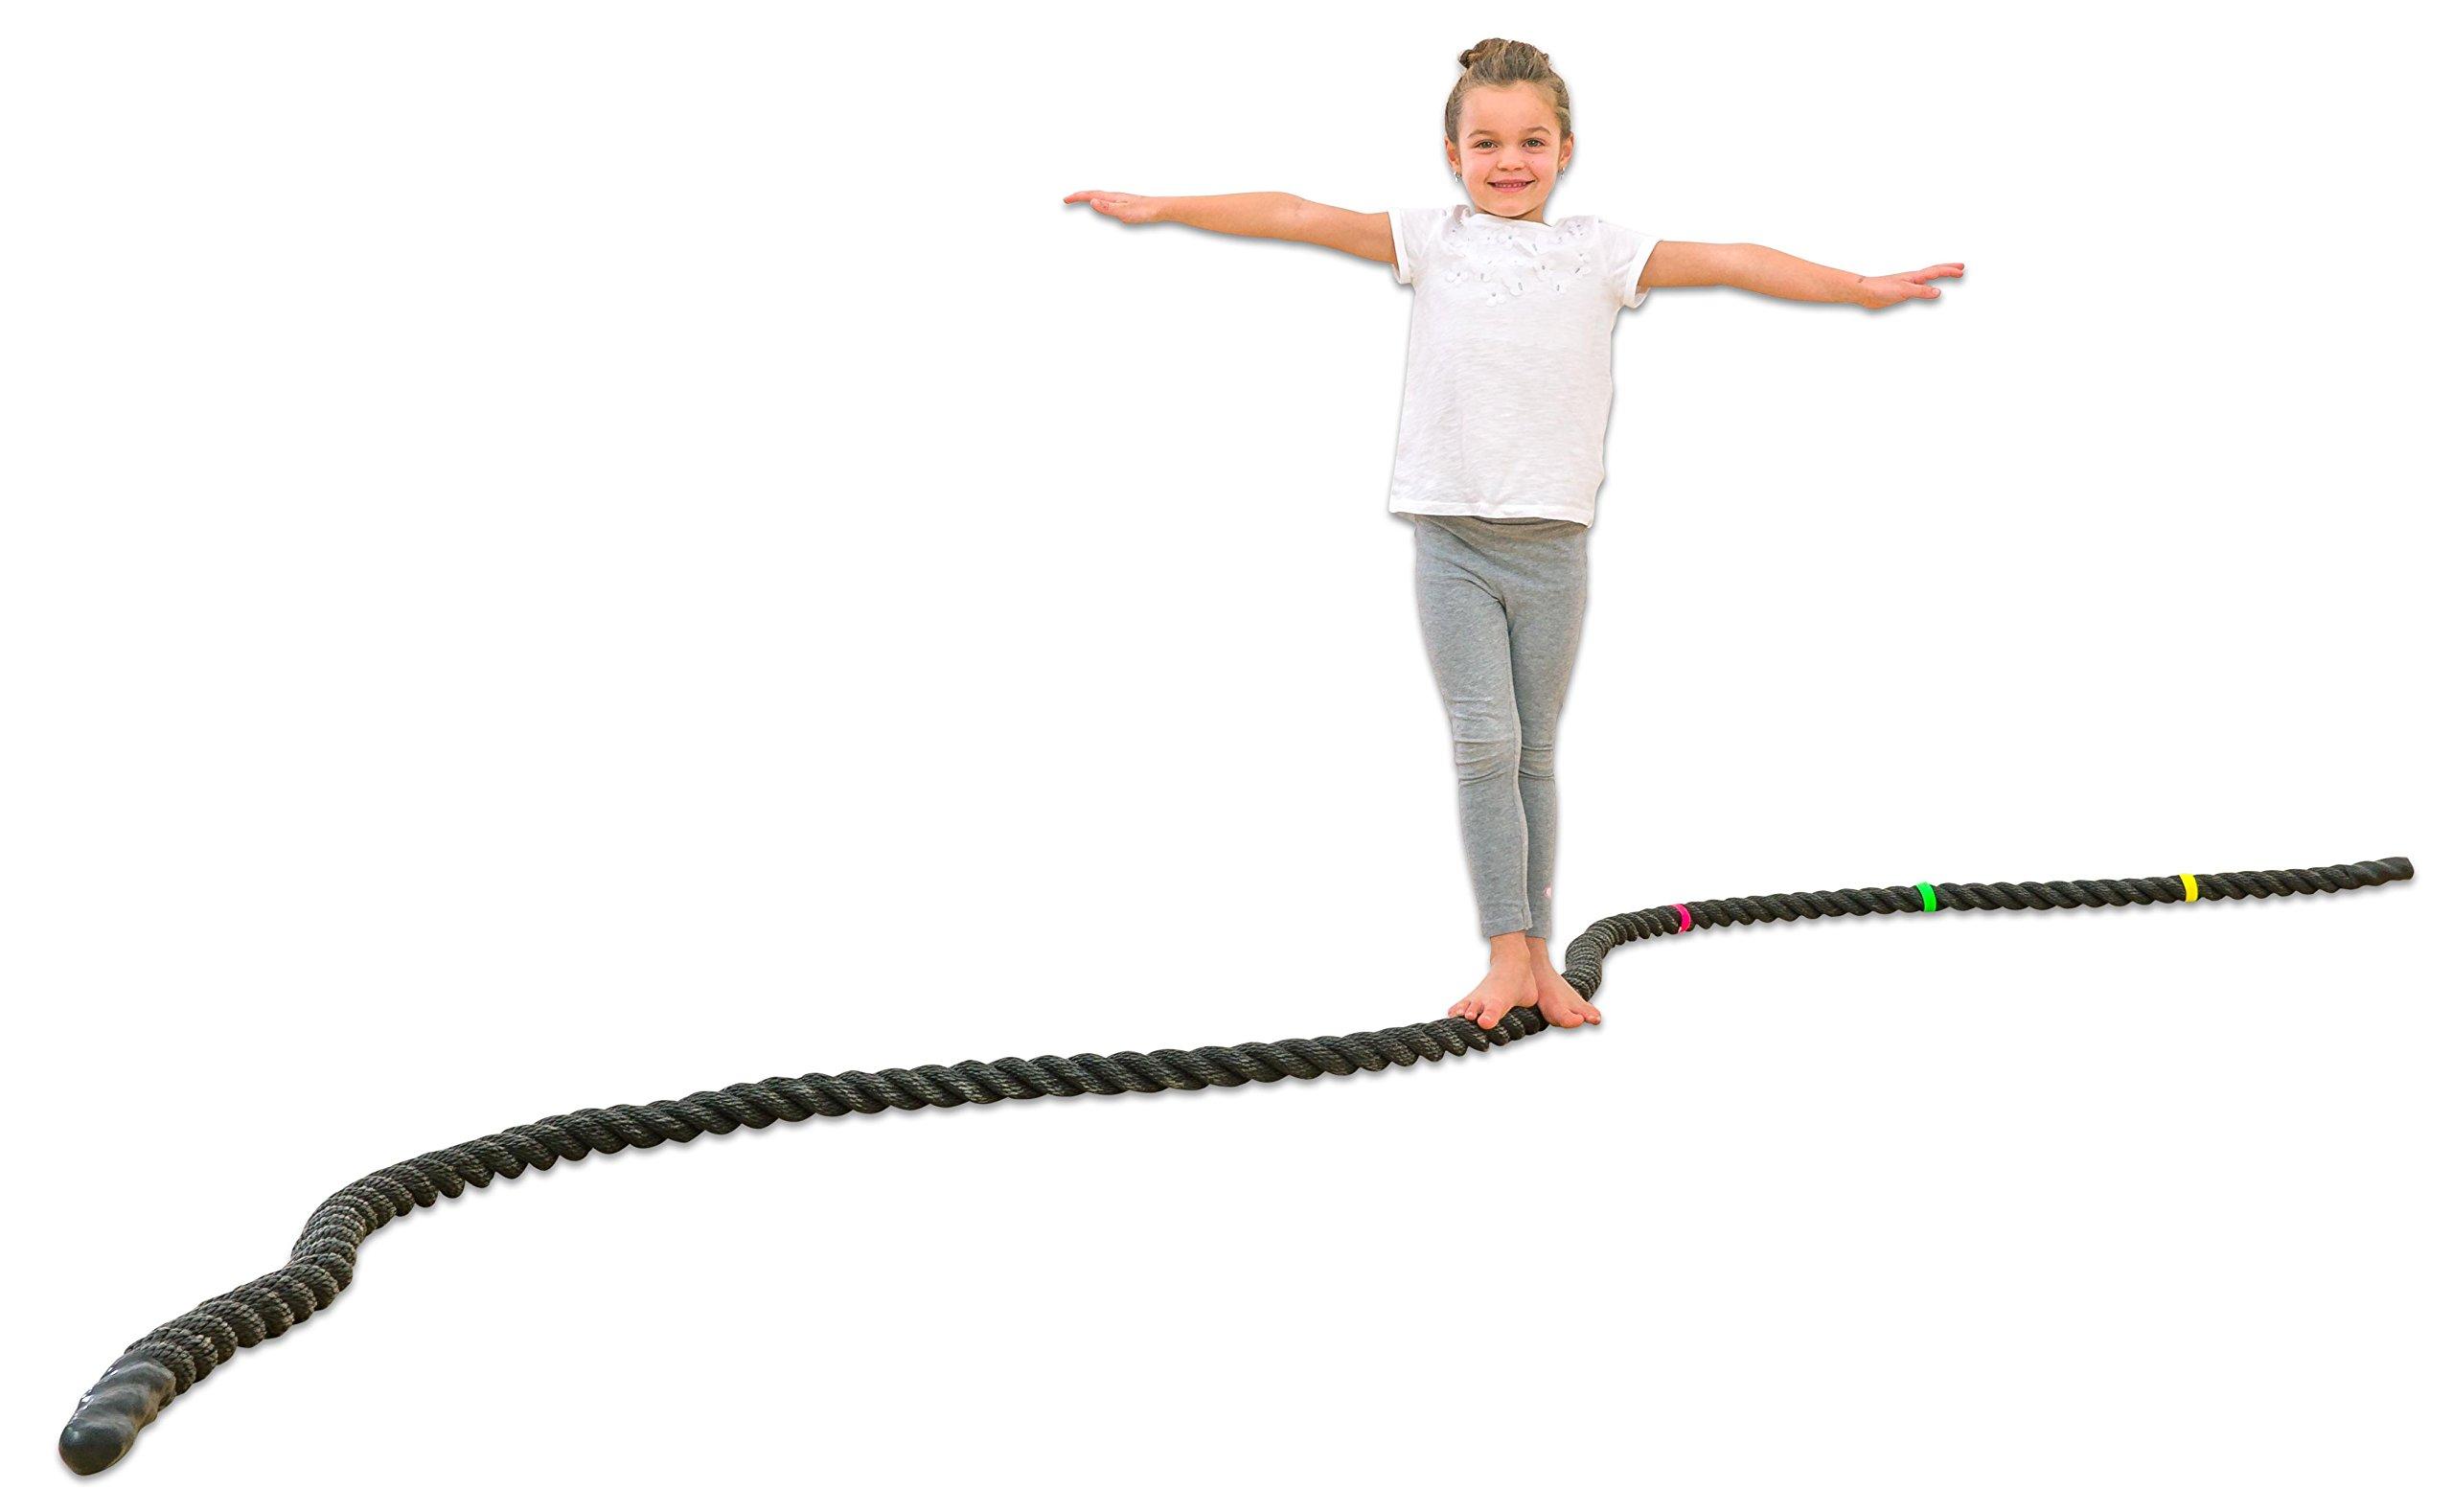 Betzold-Balanciertau–4-cm-5-m-Tau-Seil-balancieren-Kinder-Gleichgewicht-Motorik